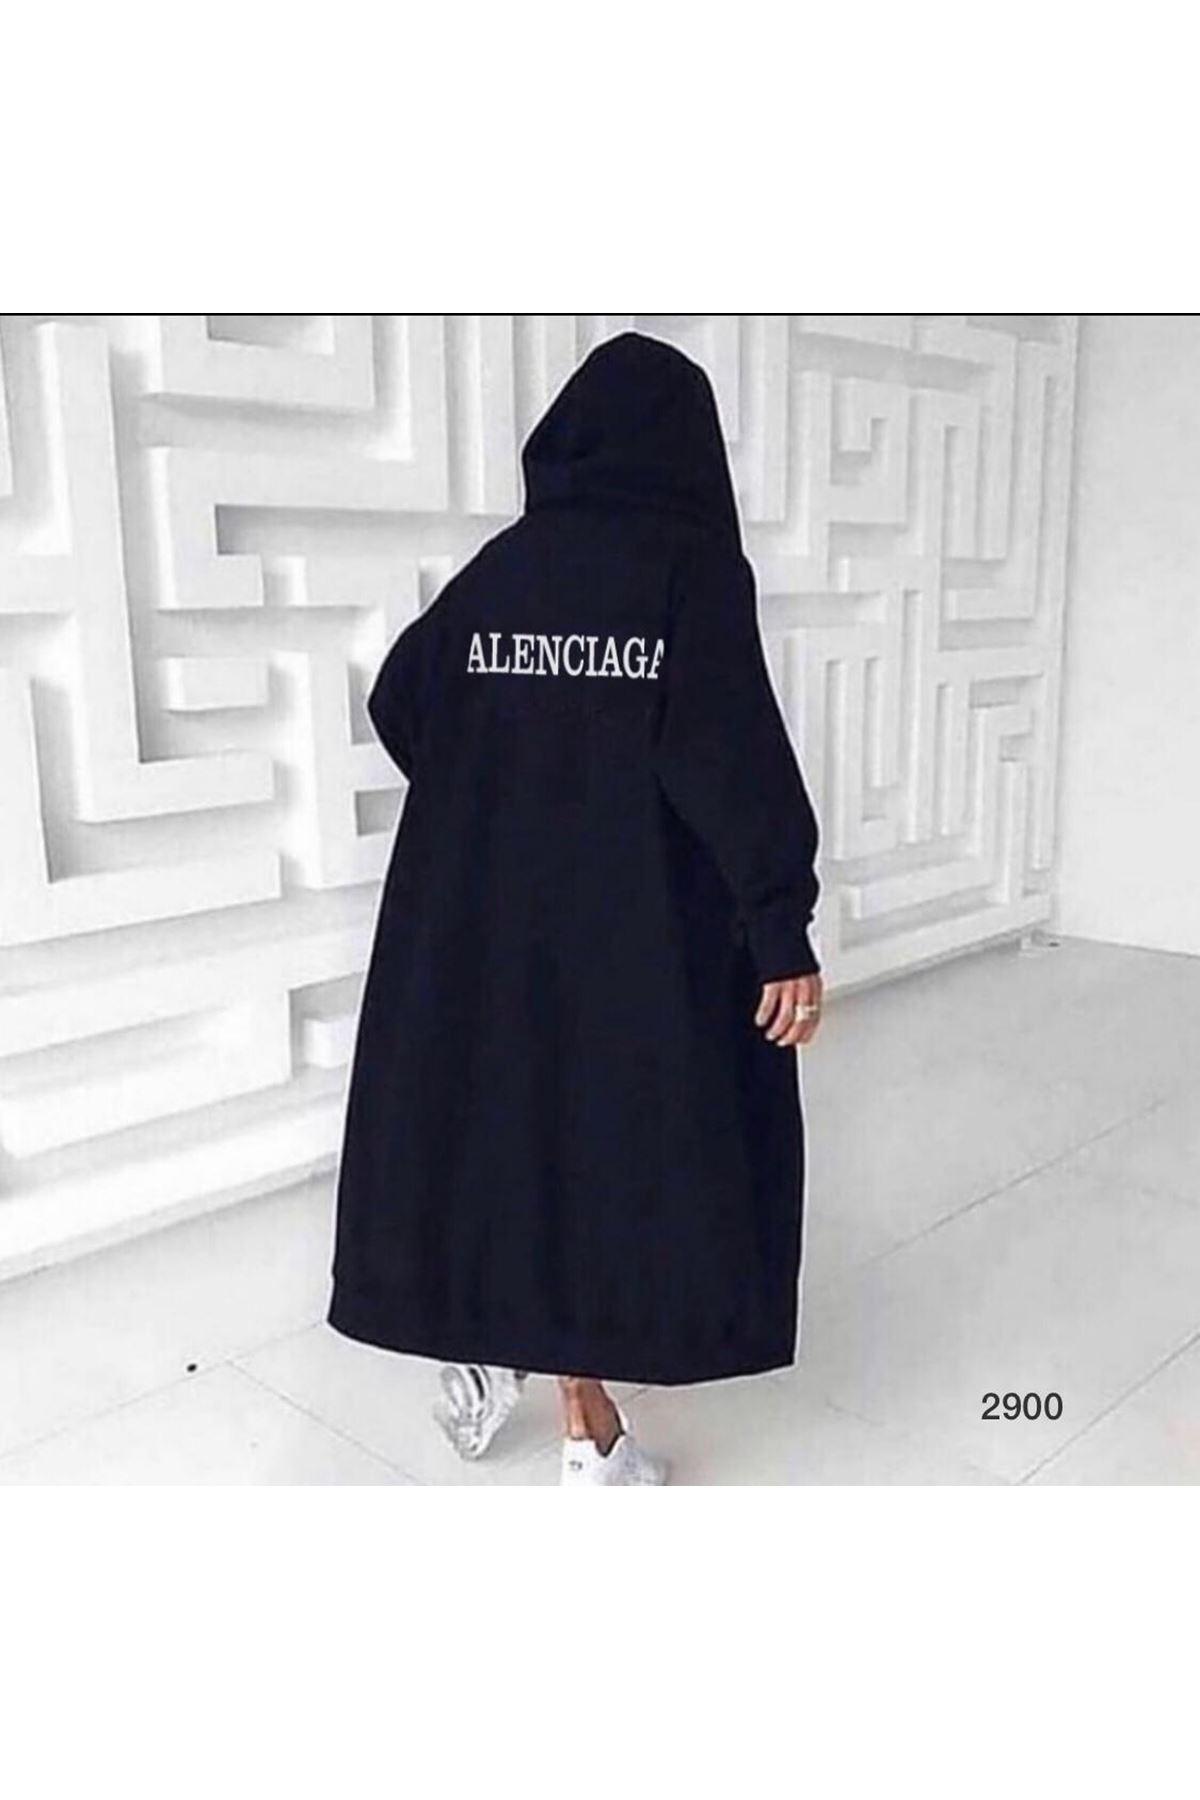 Bale Model Kapşonlu Ceket - siyah